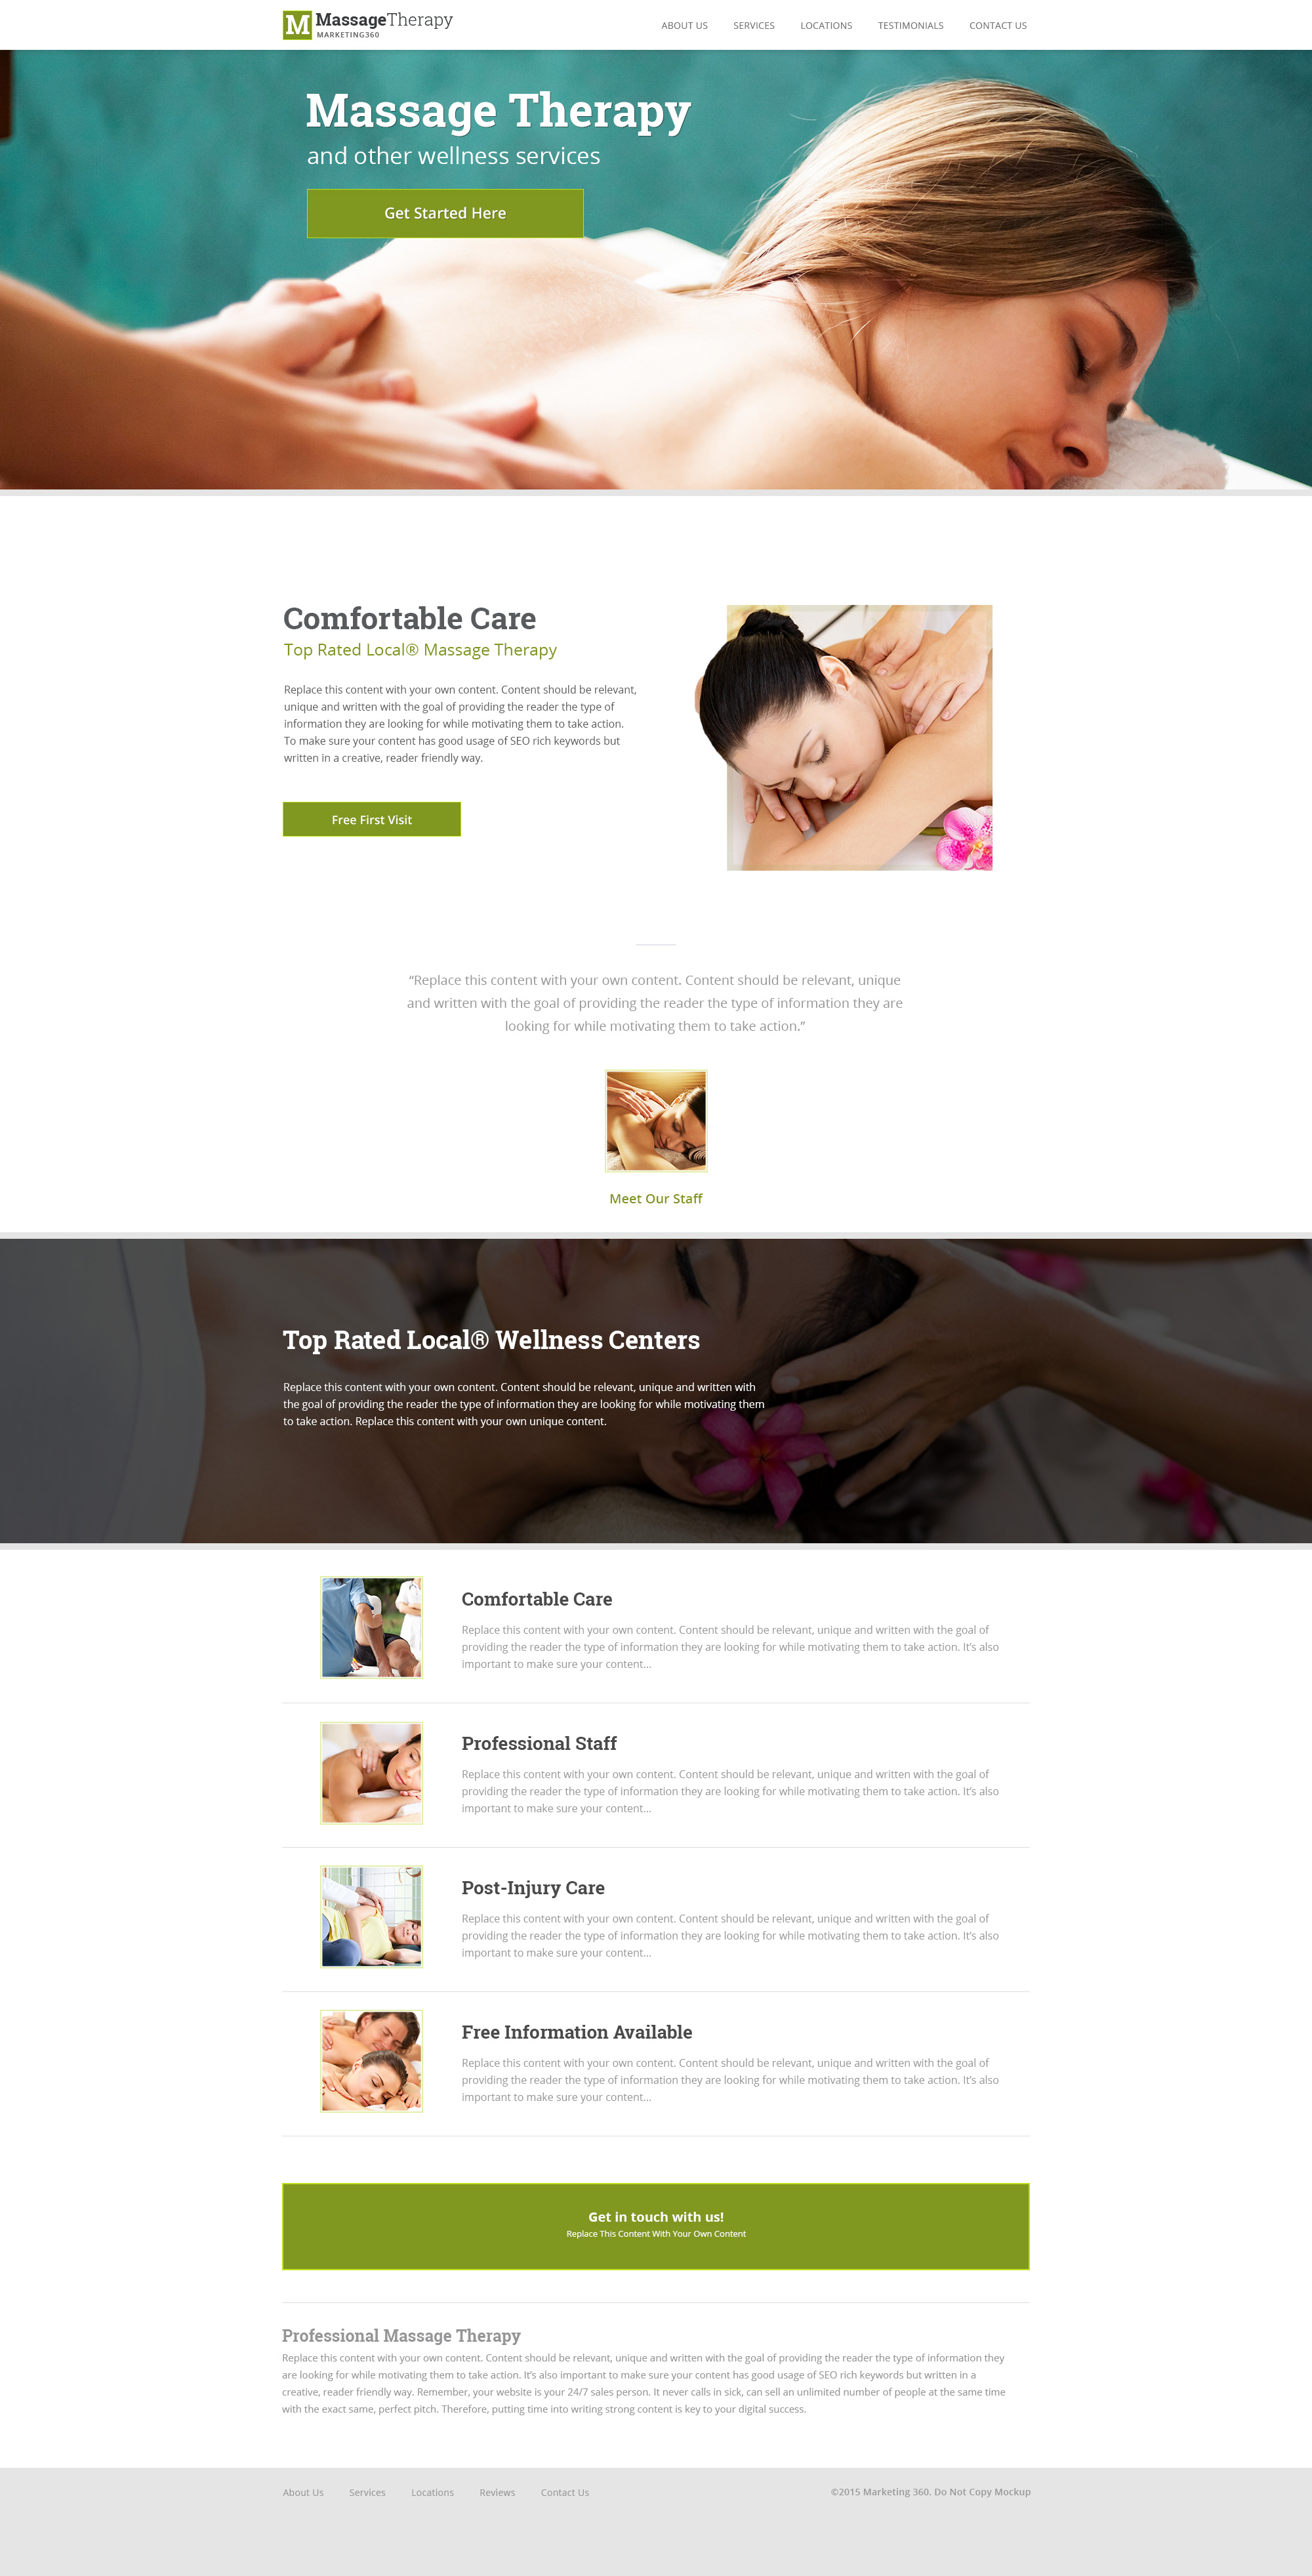 massage therapist website templates mobile responsive designs. Black Bedroom Furniture Sets. Home Design Ideas